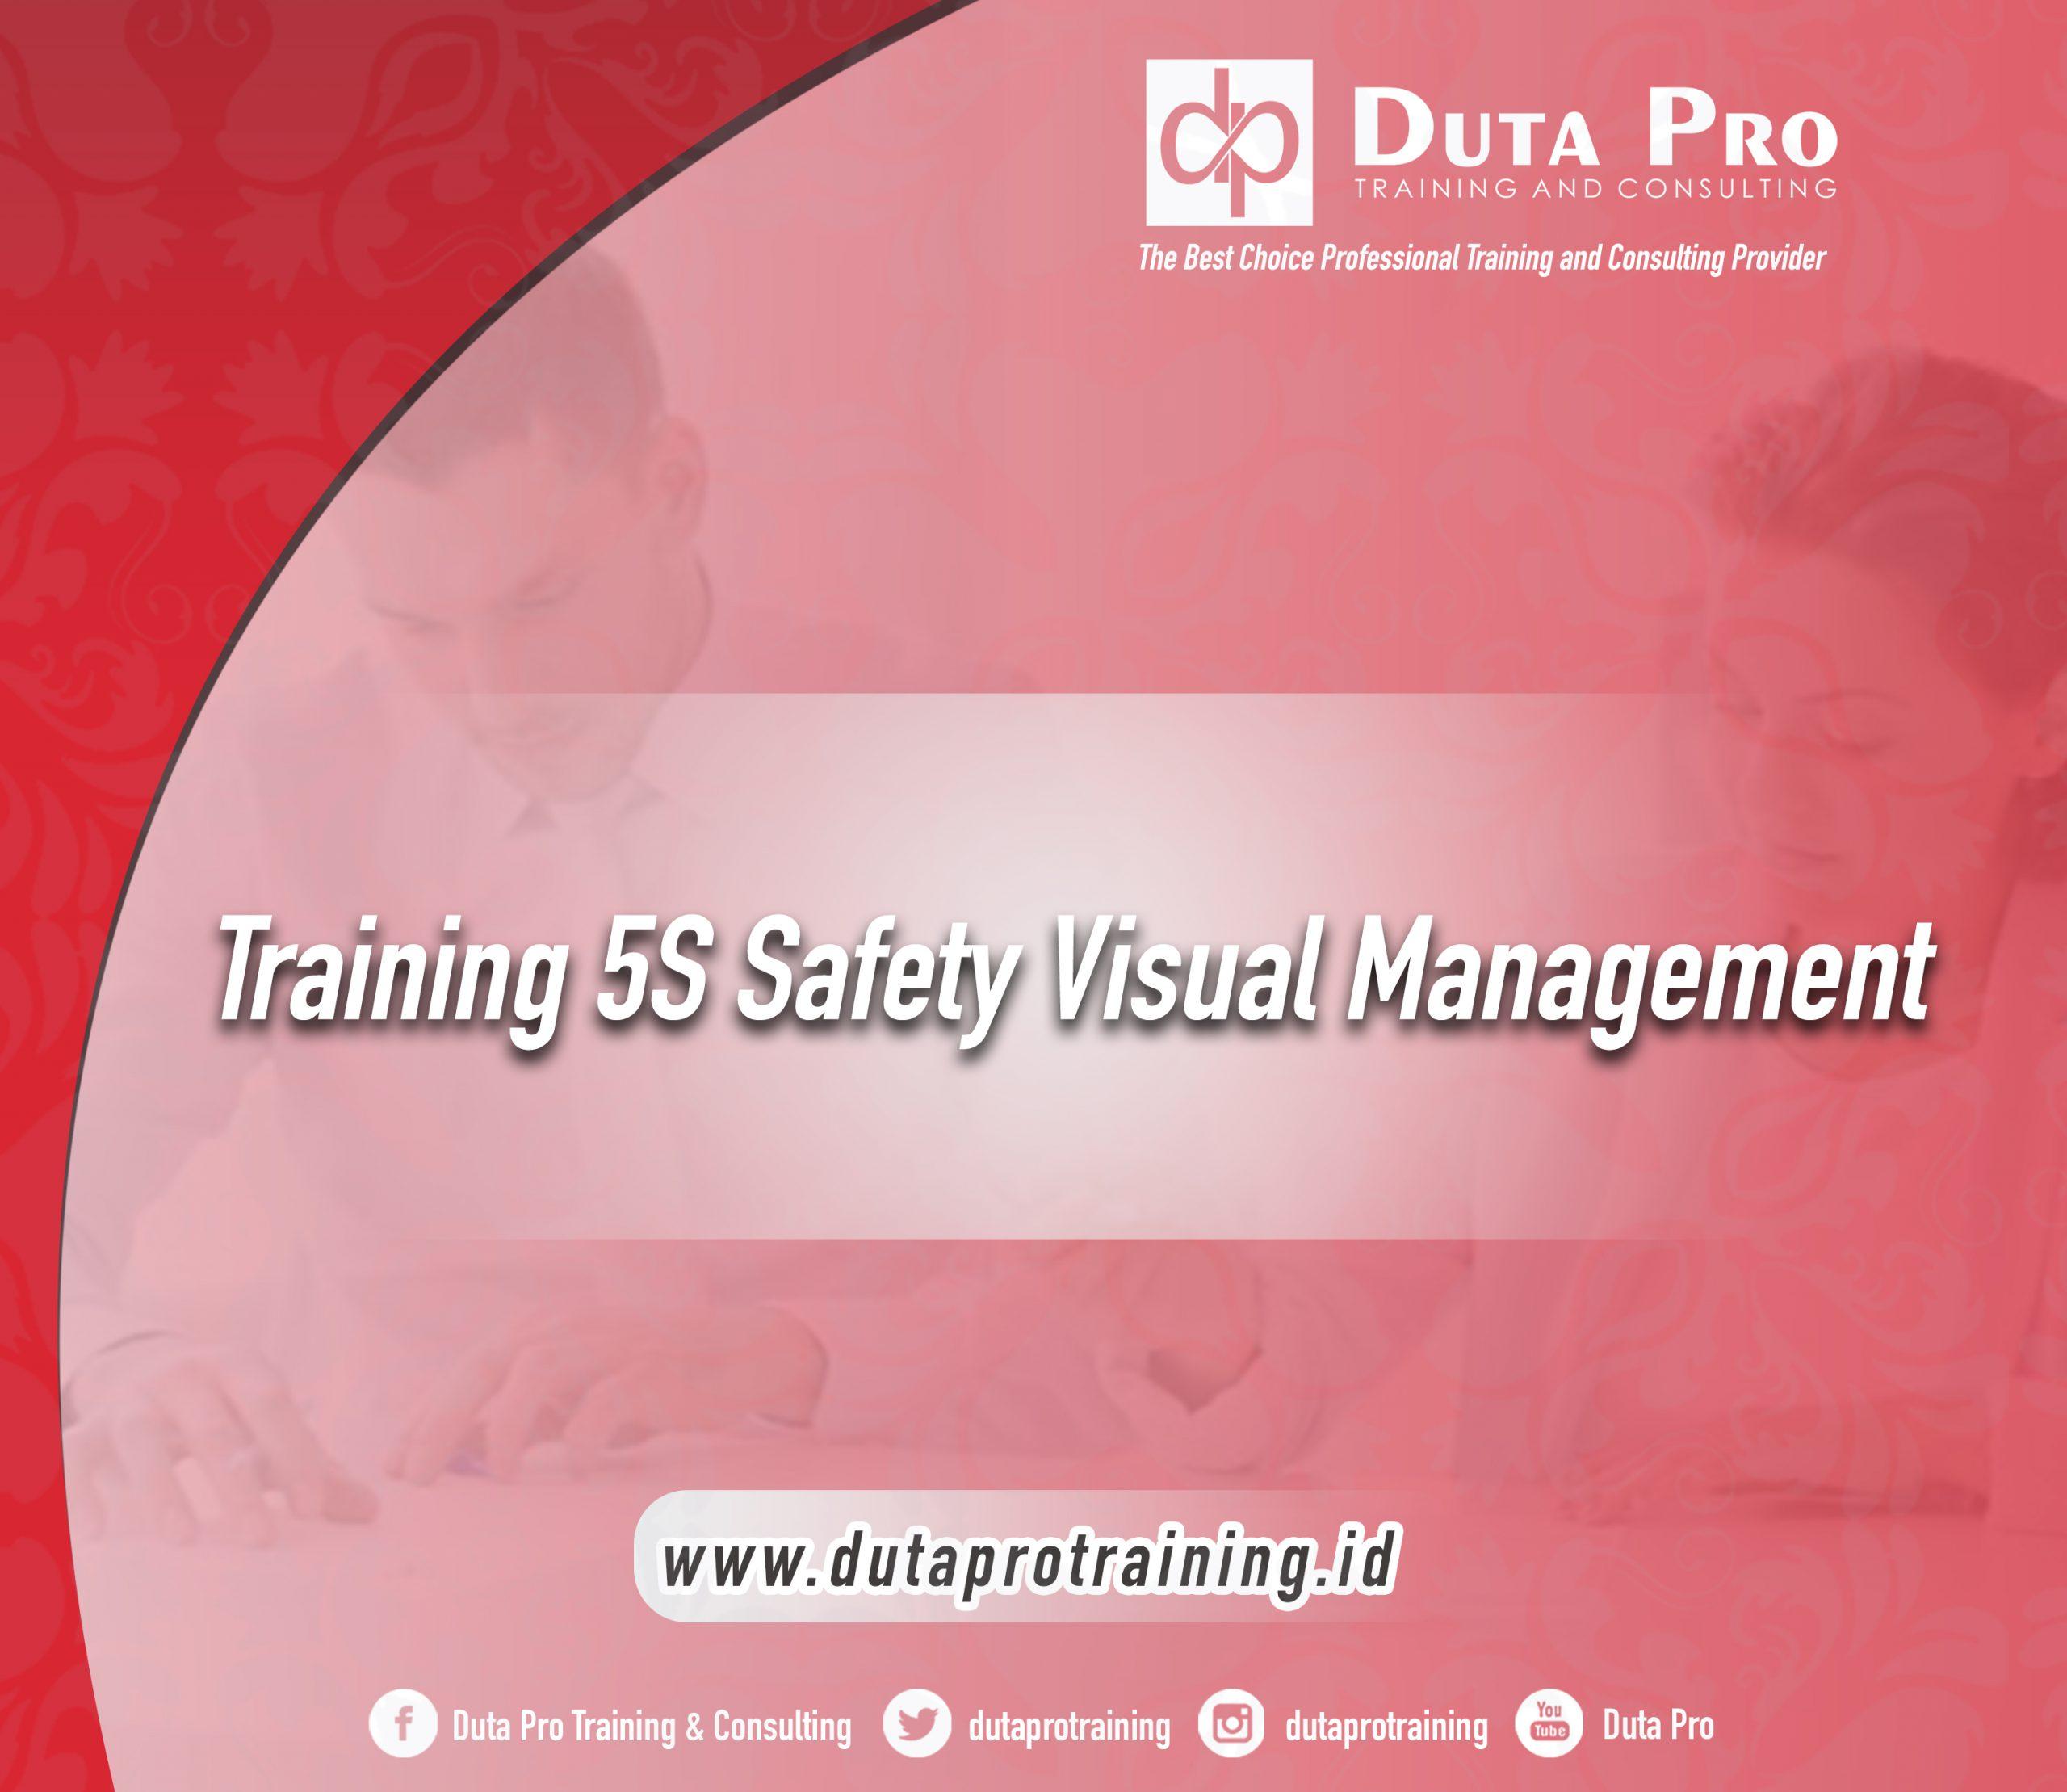 Training 5S Safety Visual Management